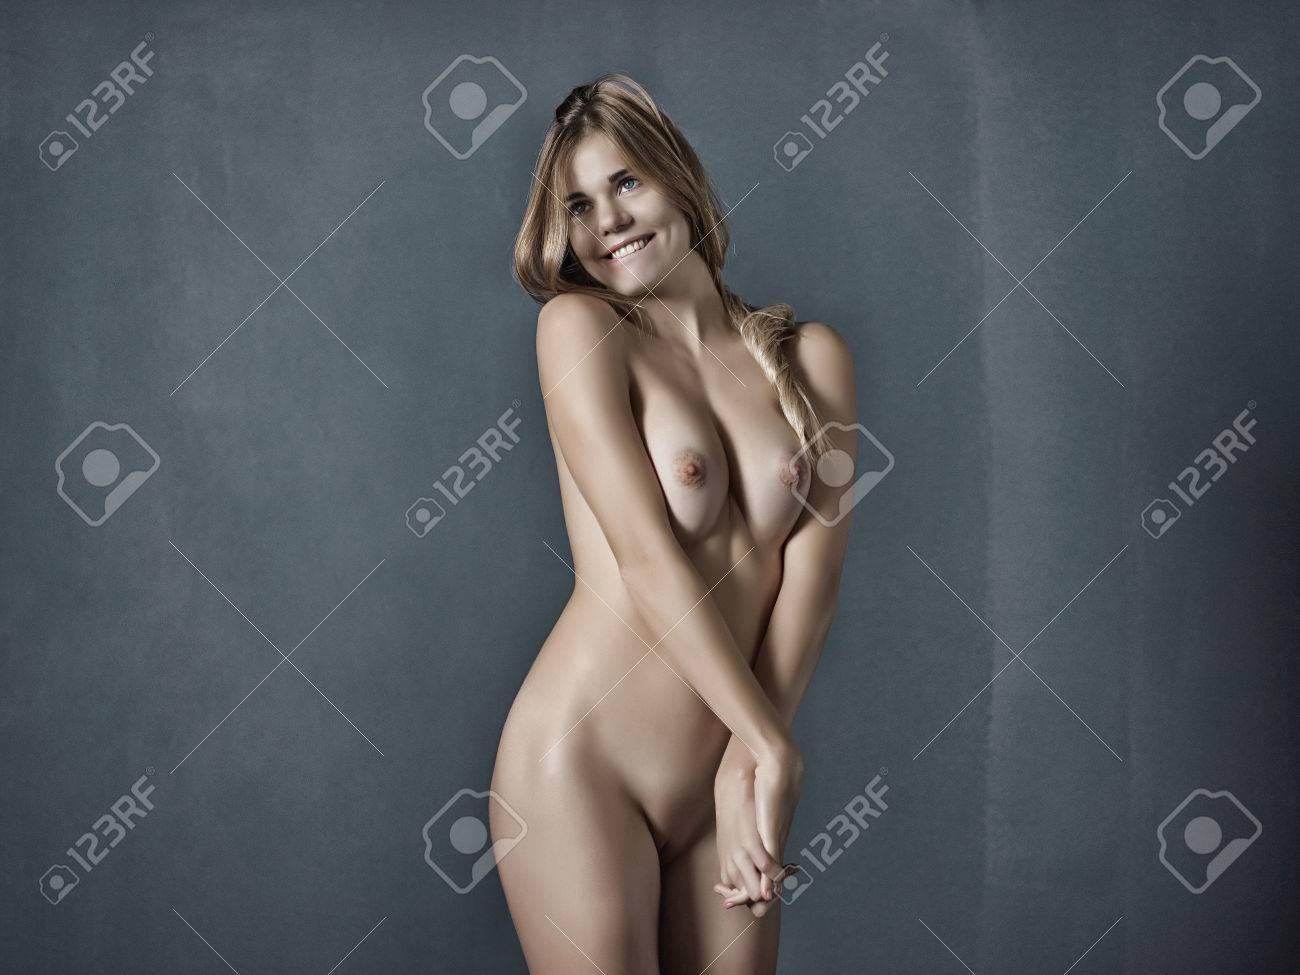 Van young cock naked girls